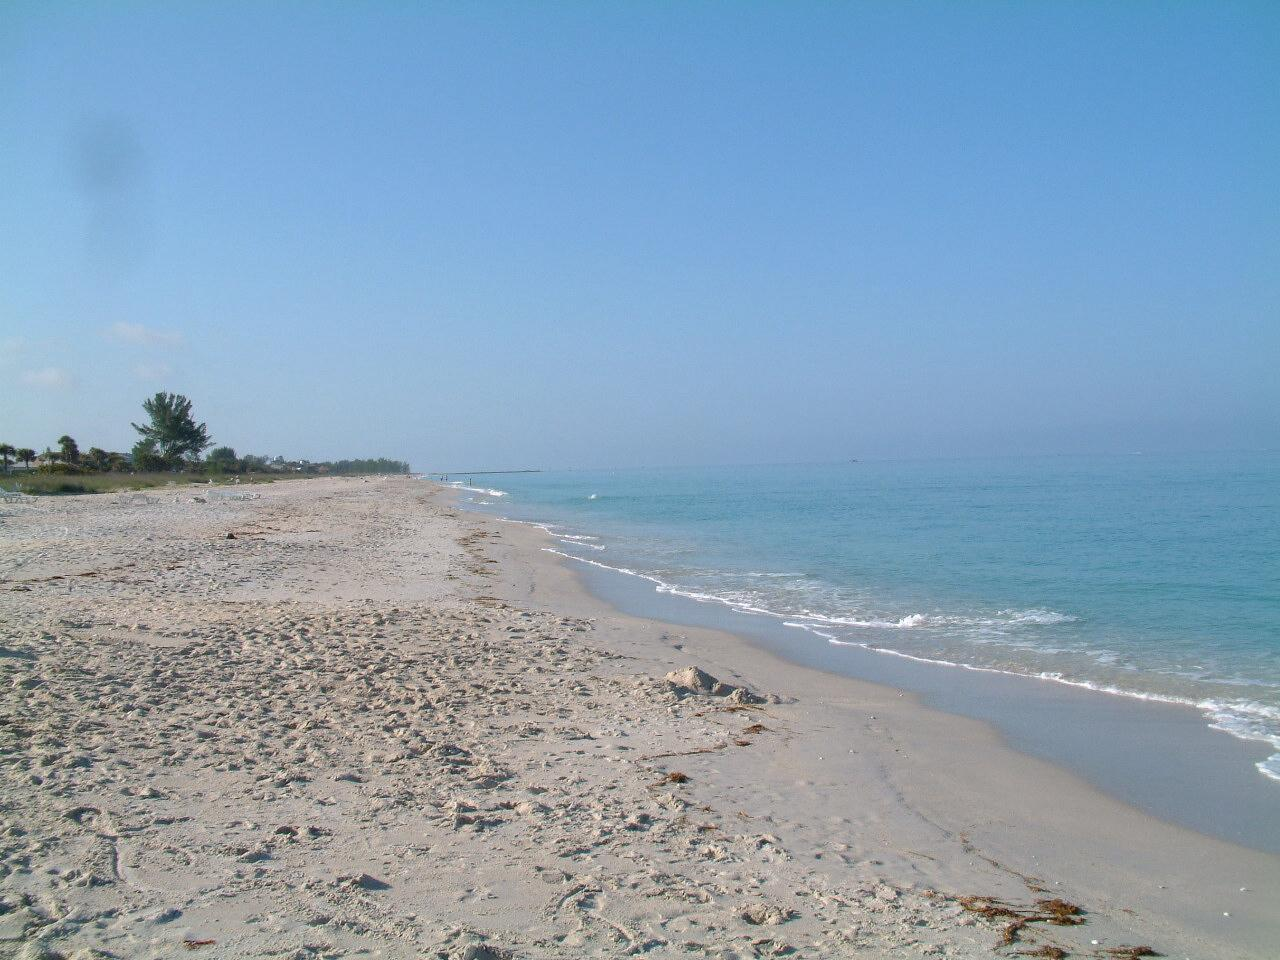 gulf sands beach motel on the beach beach front florida. Black Bedroom Furniture Sets. Home Design Ideas